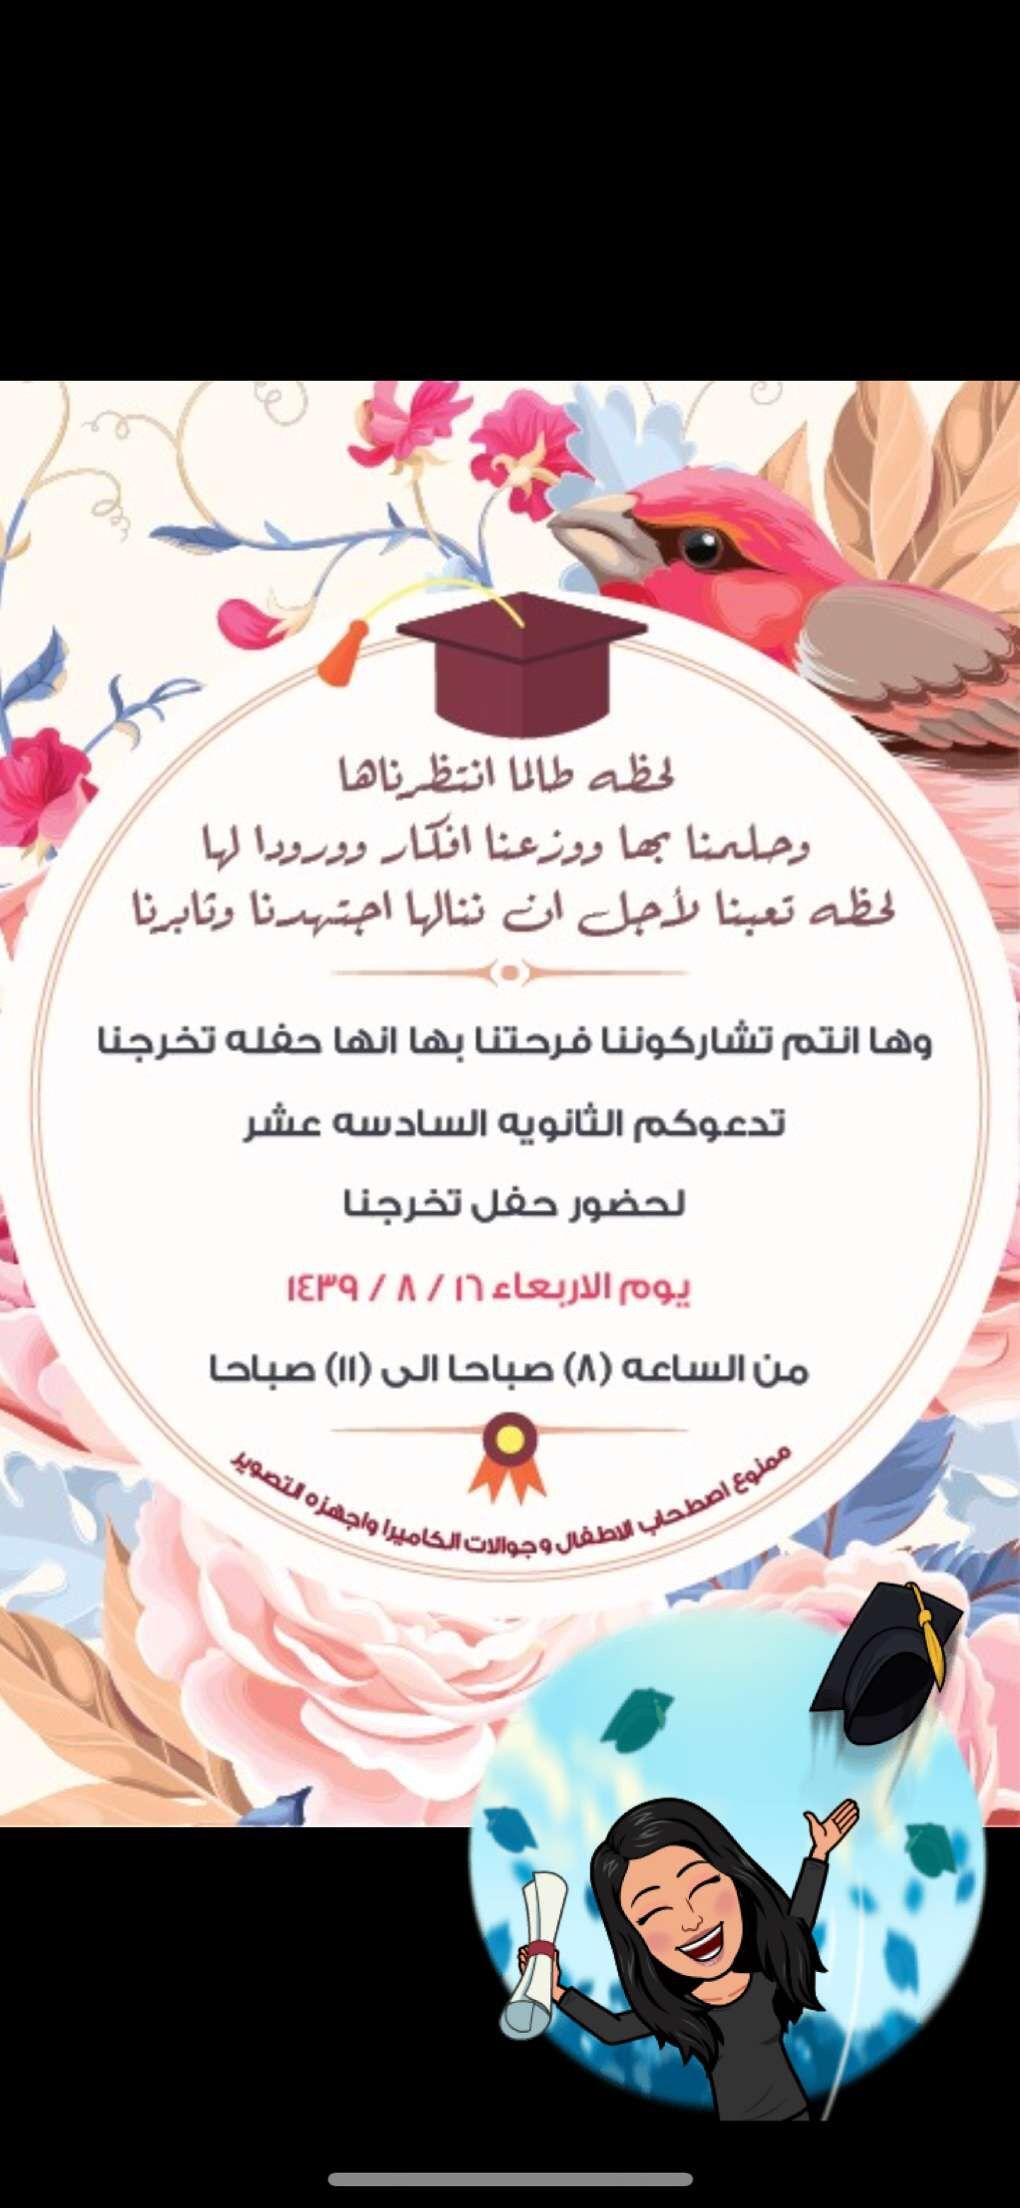 Graduation Invitation Cards بطايق دعوه للتخرج تخرج دعوه دعوة بطايق بطاقه كروت كرت Graduation In Graduation Wallpaper Graduation Images Graduation Girl